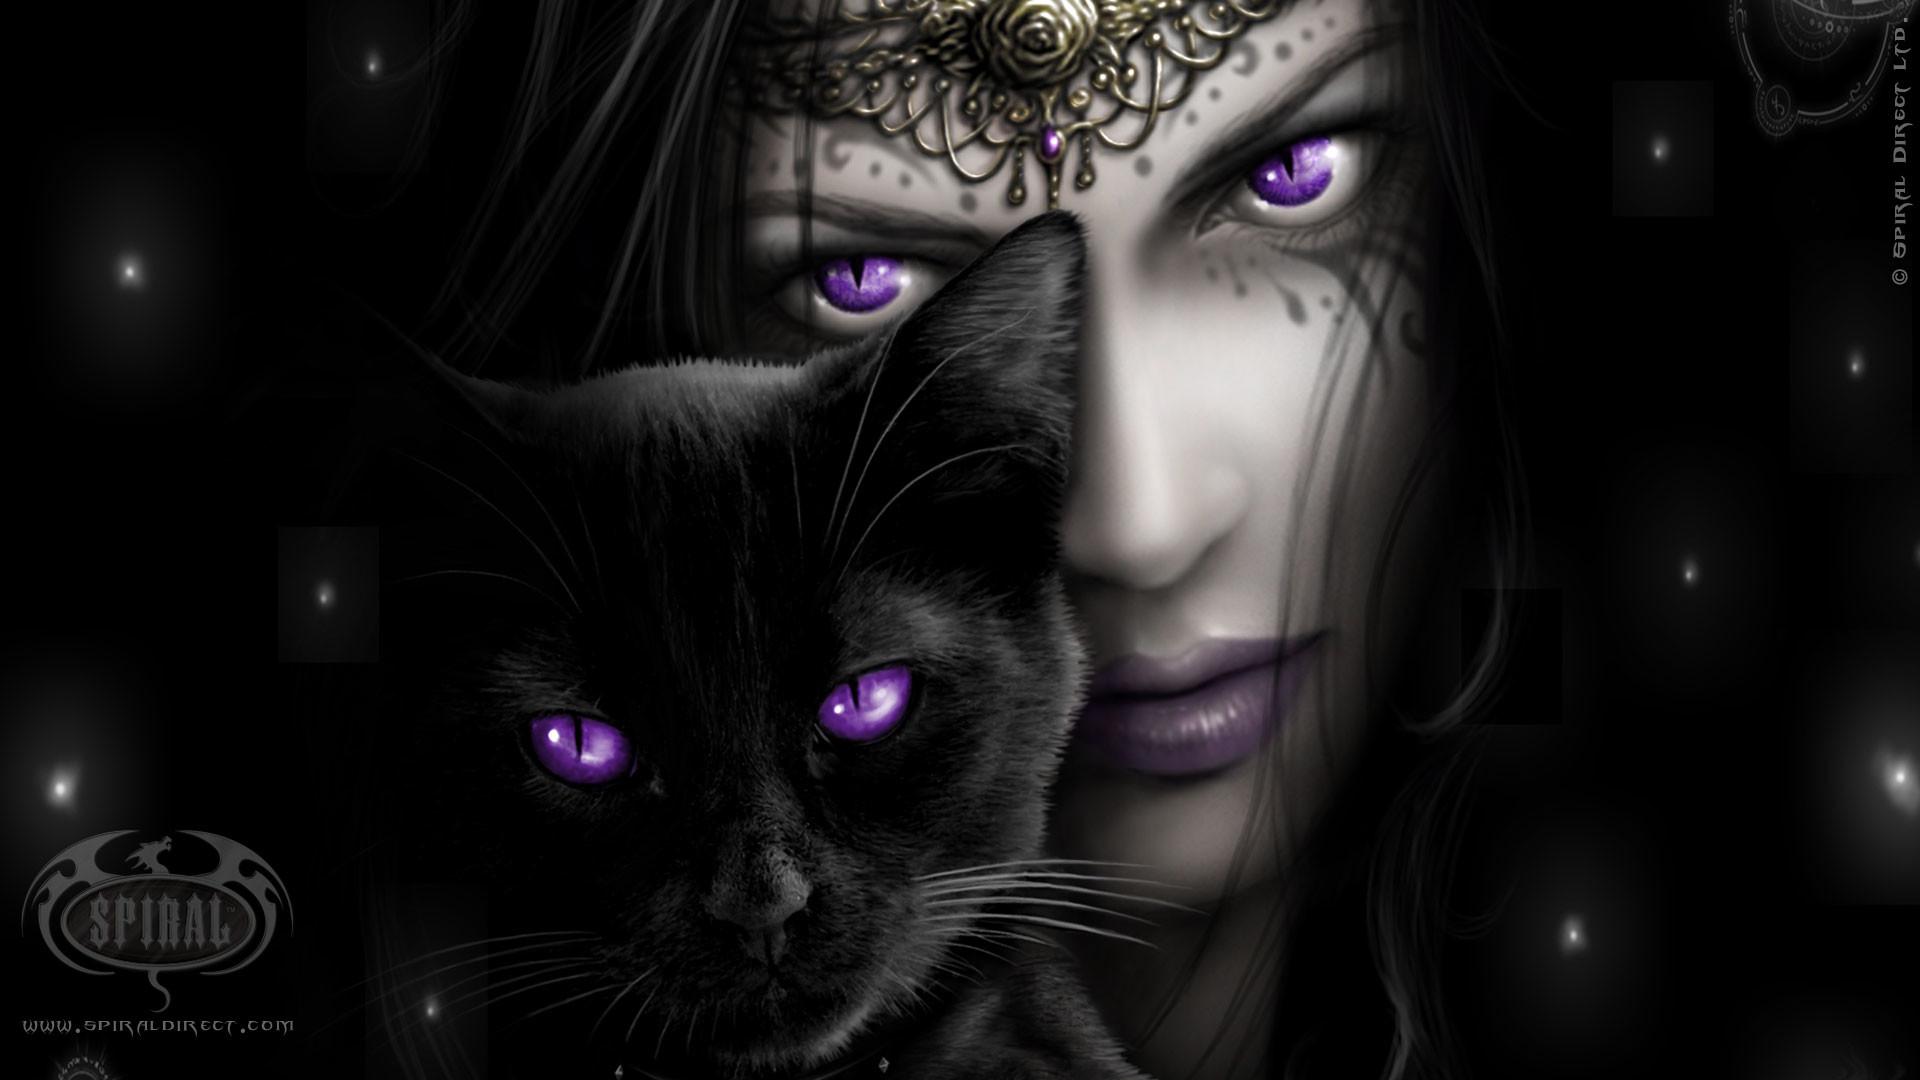 purple eyes Computer Wallpapers, Desktop Backgrounds | | ID .